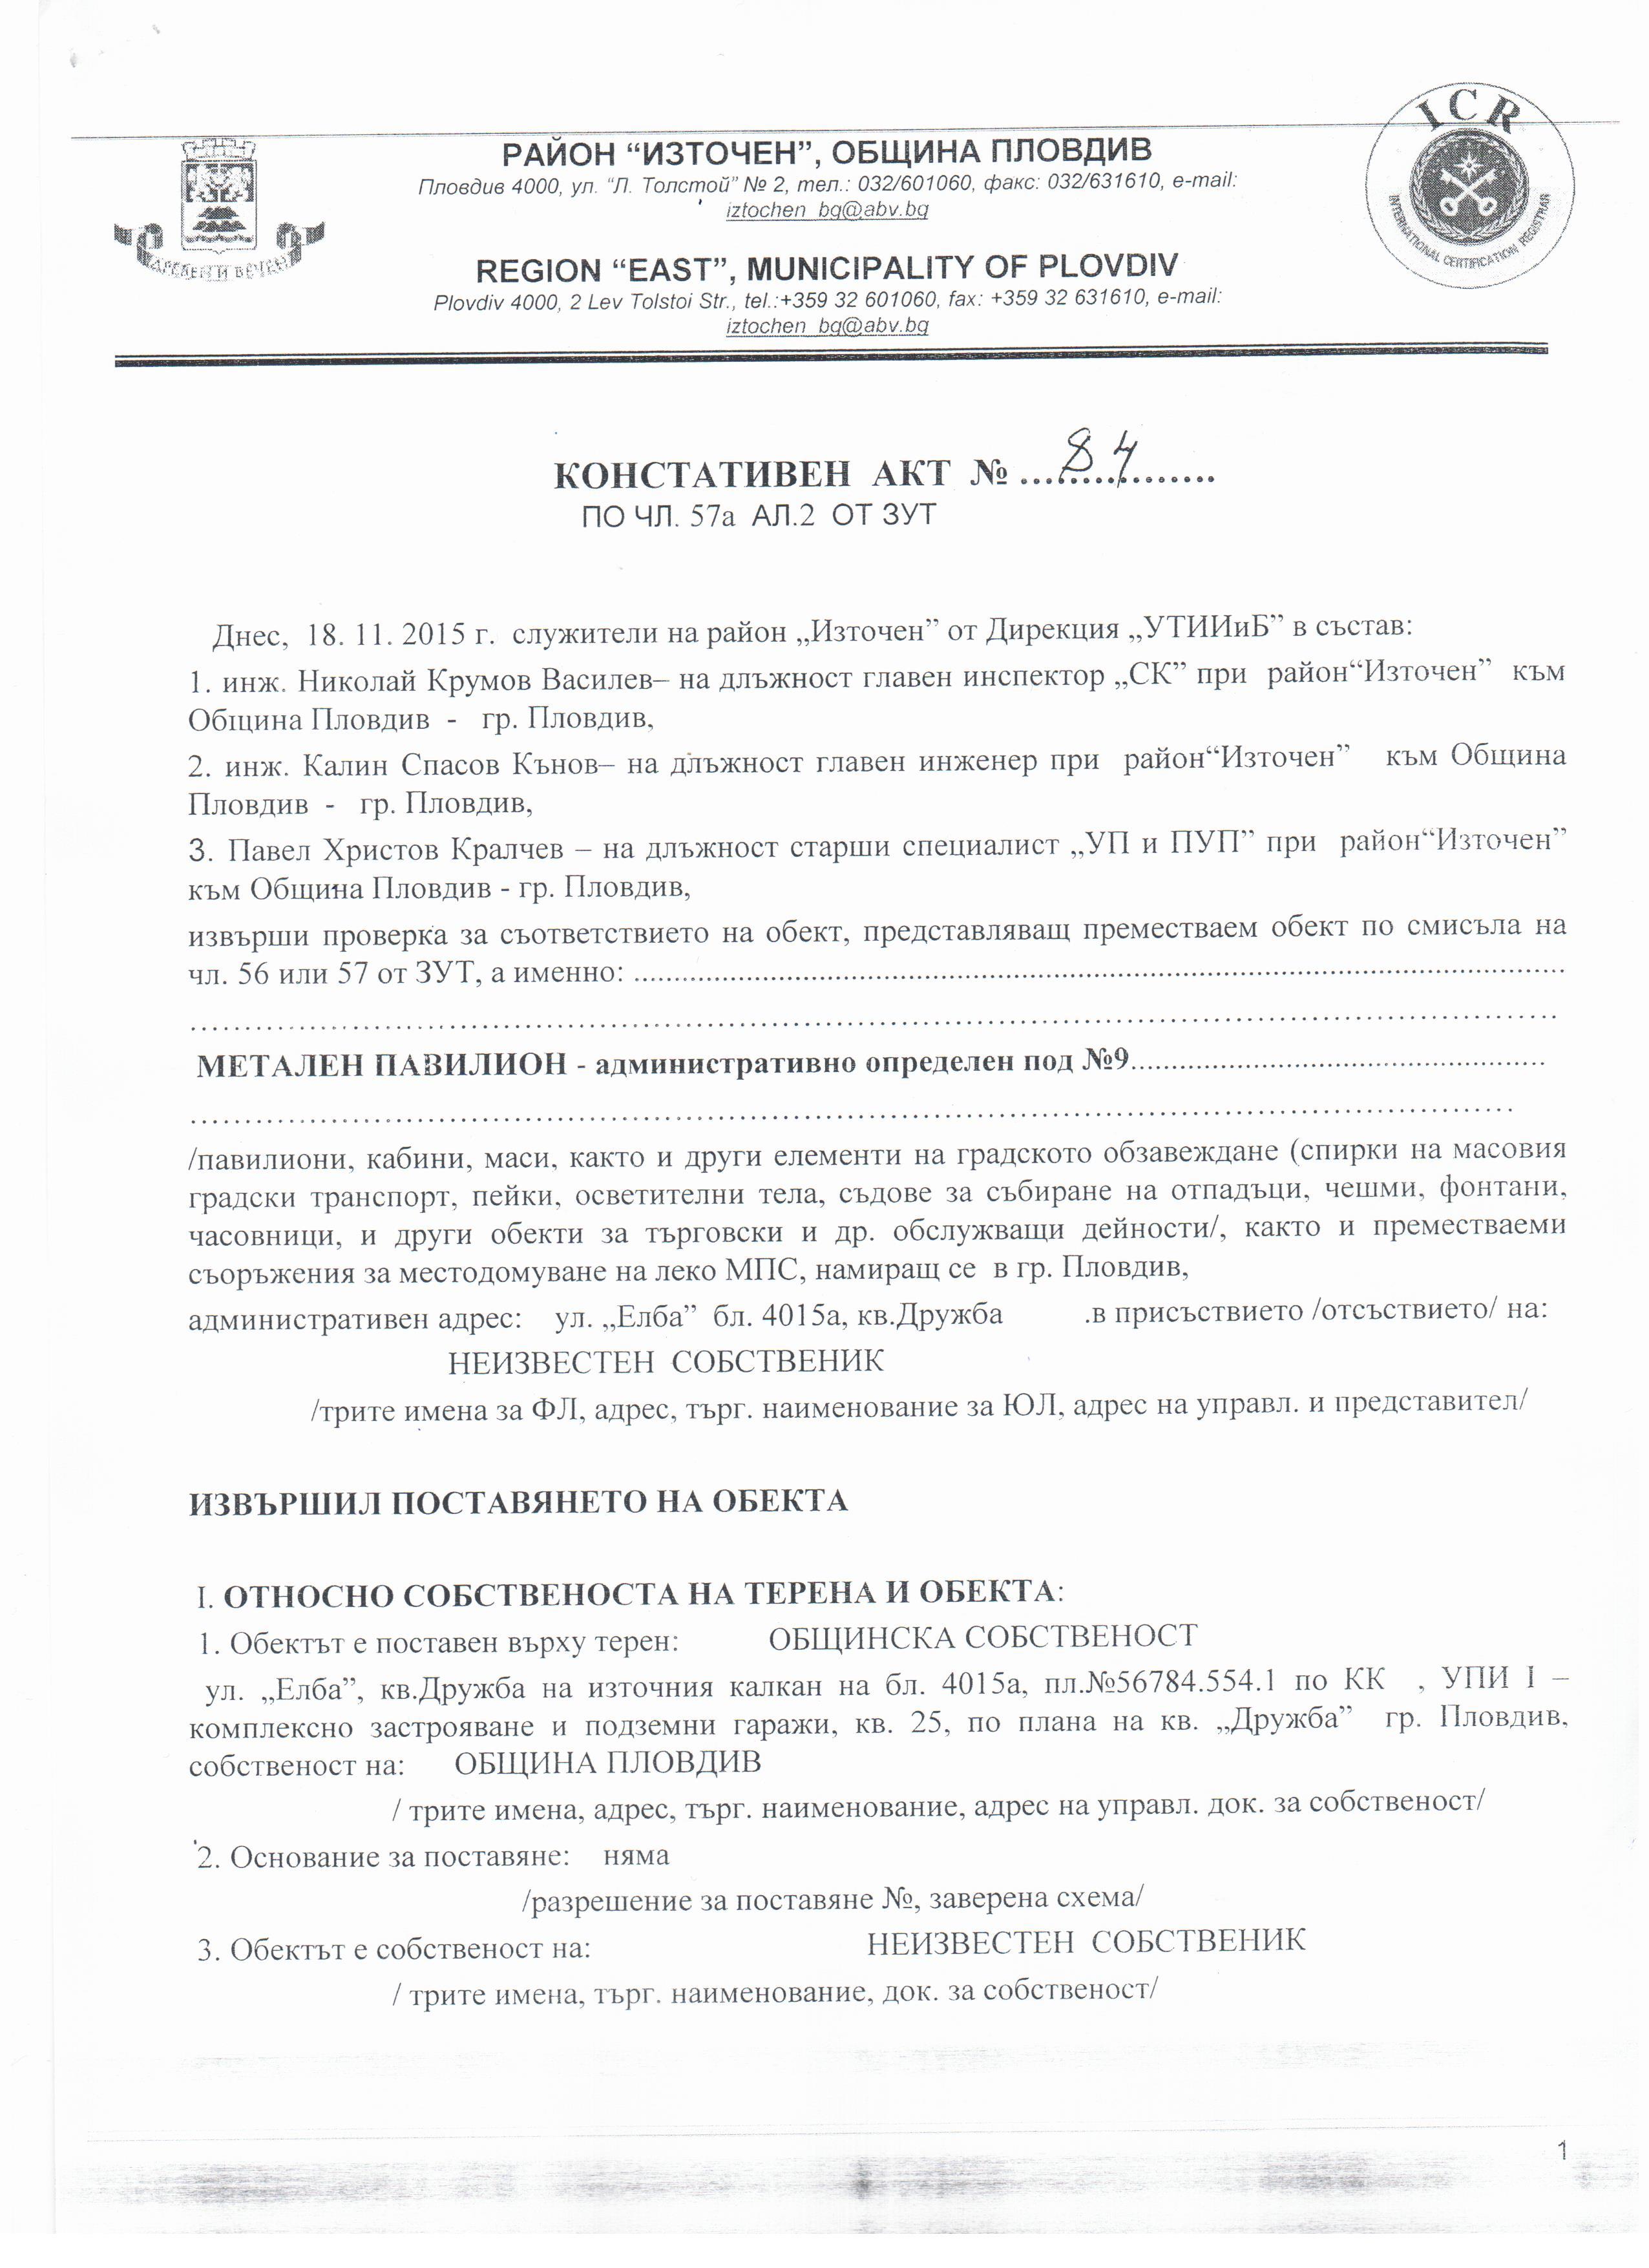 KONSTATIVEN_AKT_№84